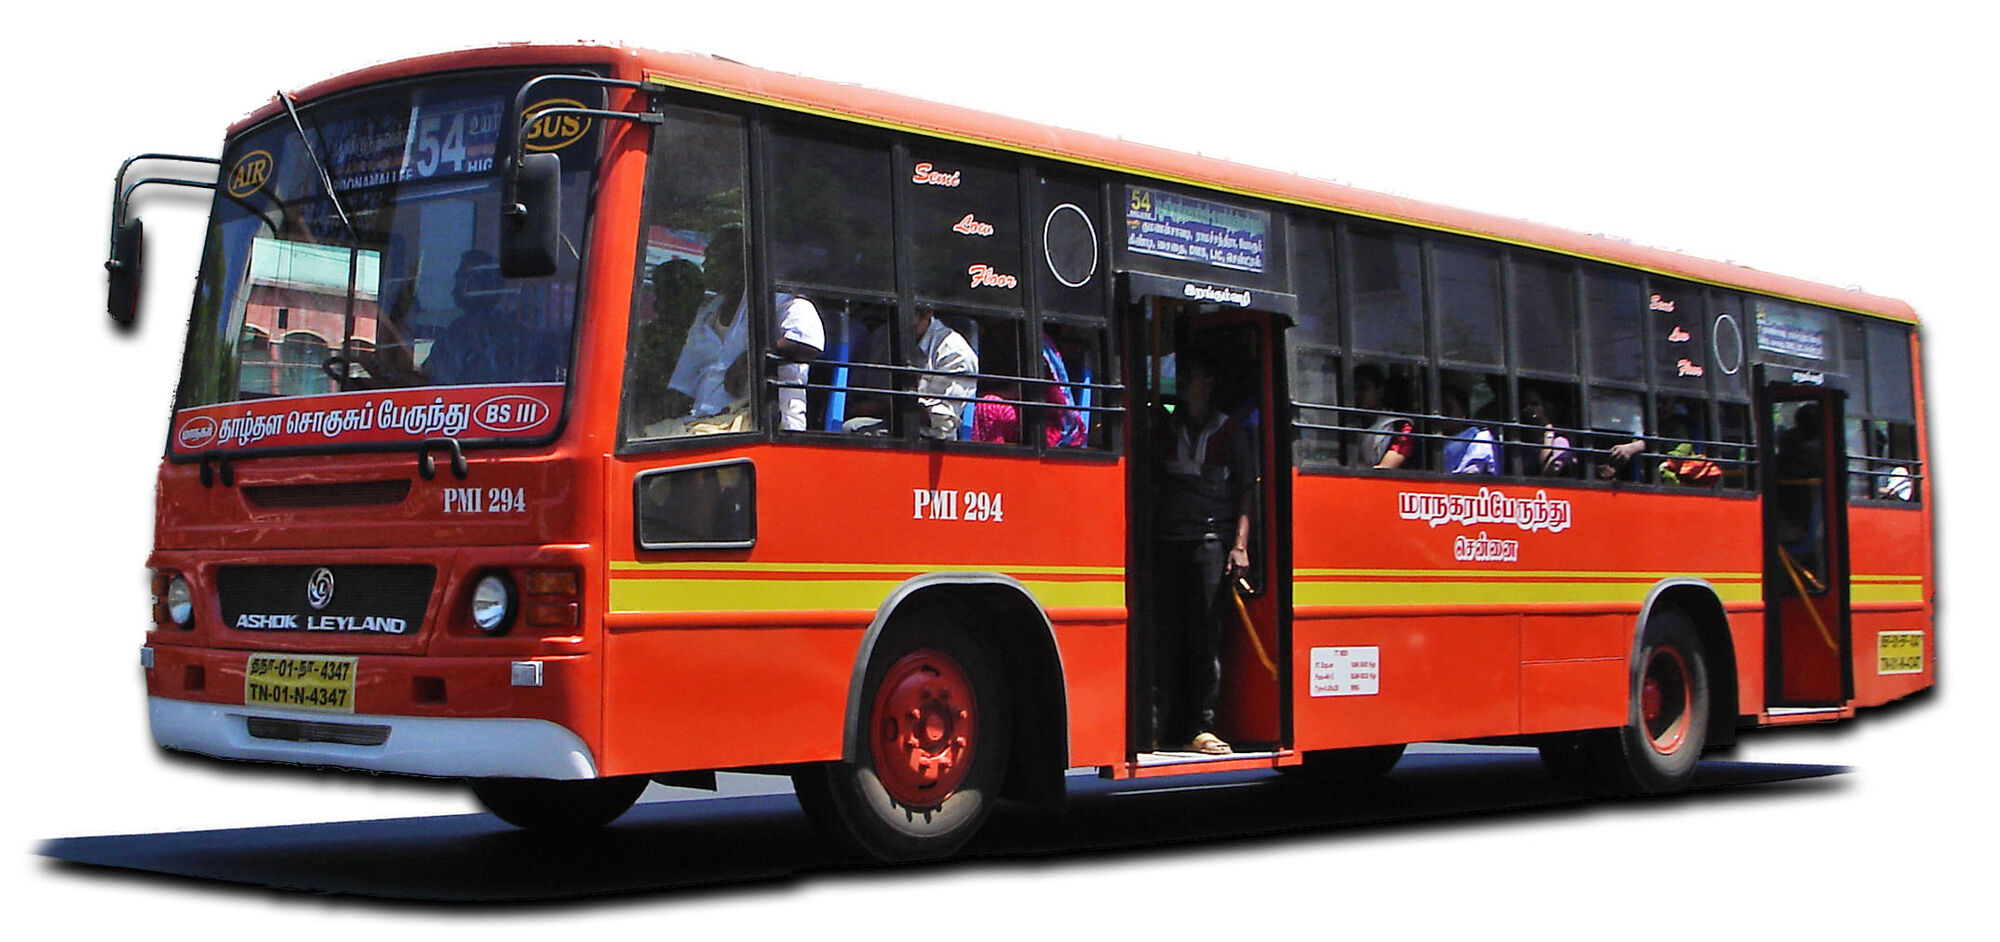 Ashok Leyland | Tractor & Construction Plant Wiki | FANDOM powered